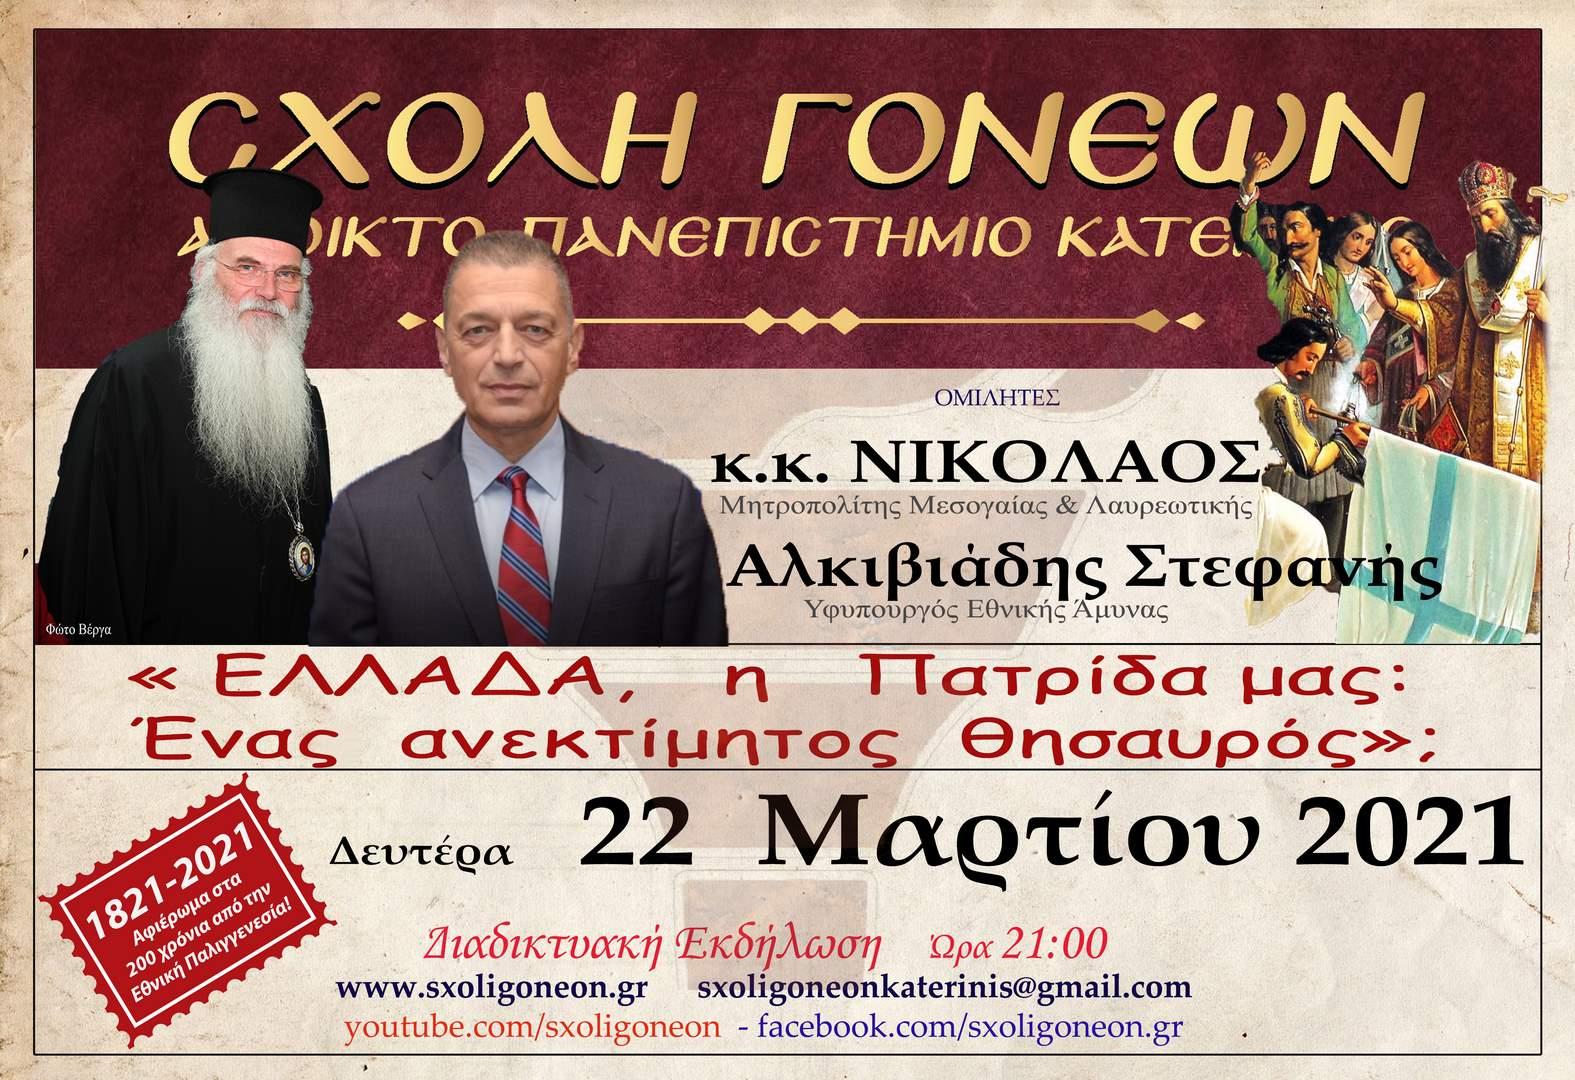 O Μητροπολίτης Μεσογαίας Κ. Νικόλαος Και Ο Υφυπ. Εθν. Άμυνας